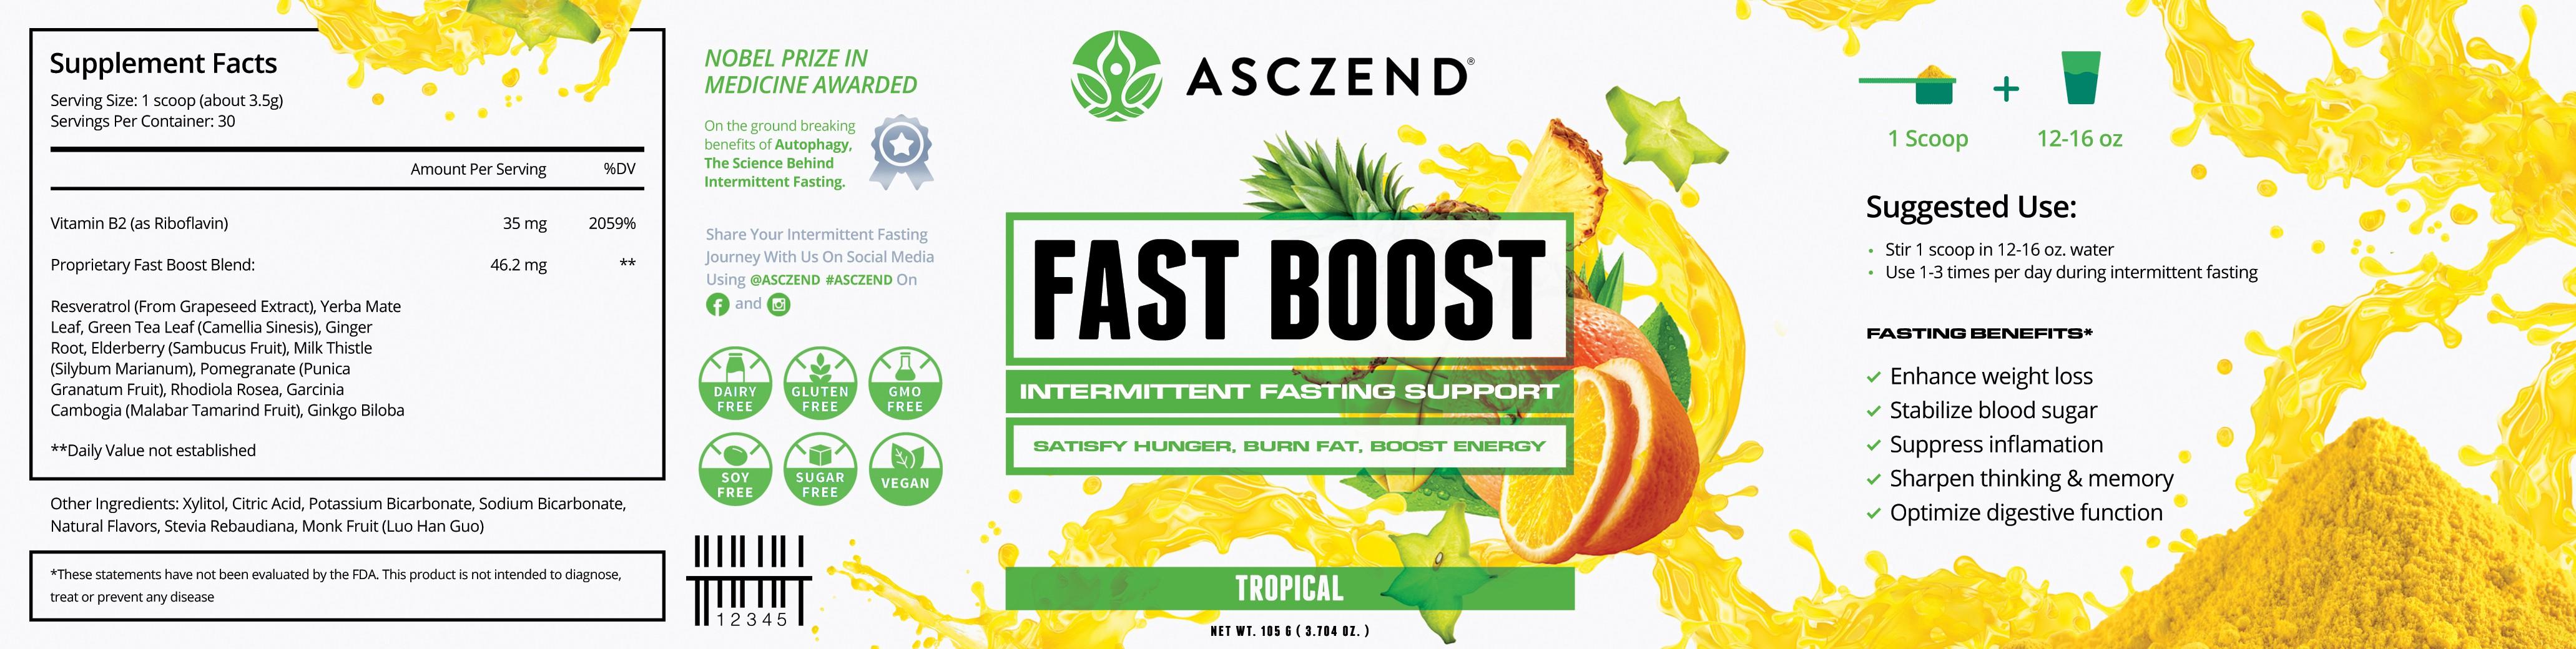 Intermittent Fasting Supplement Label Design